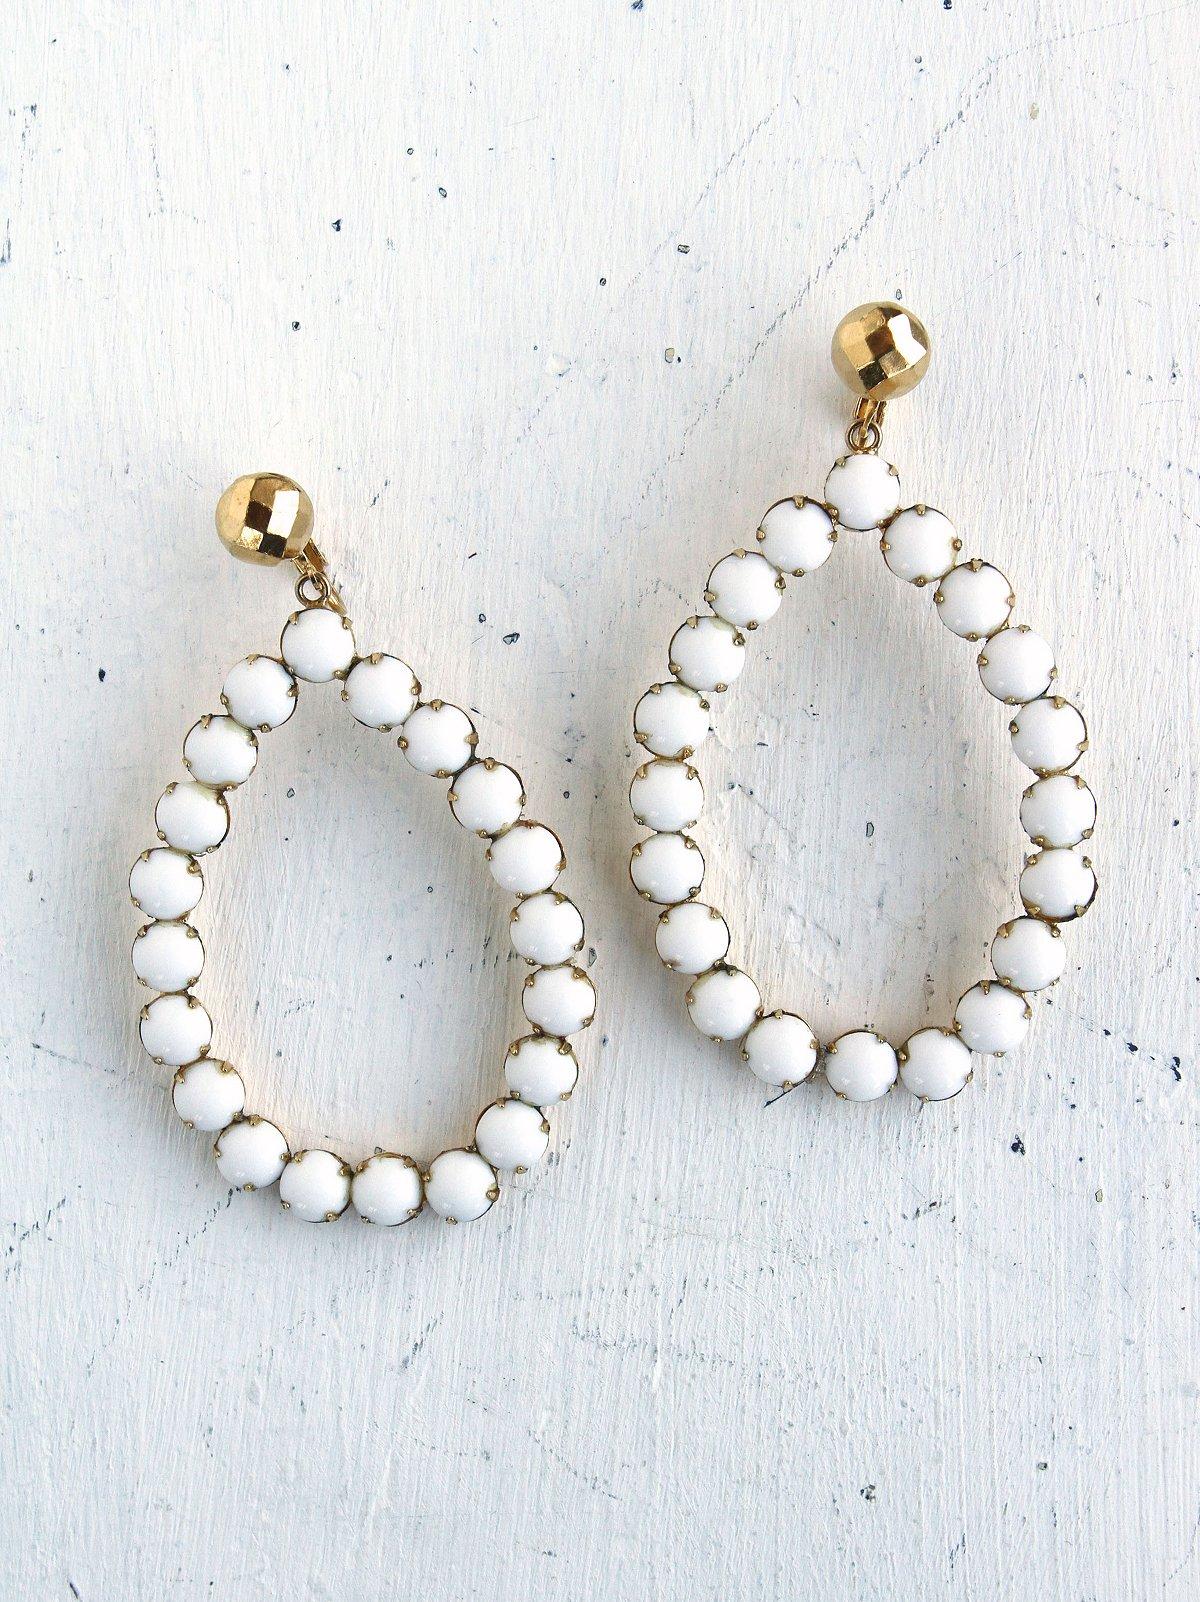 Vintage White Stud Embellished Earrings